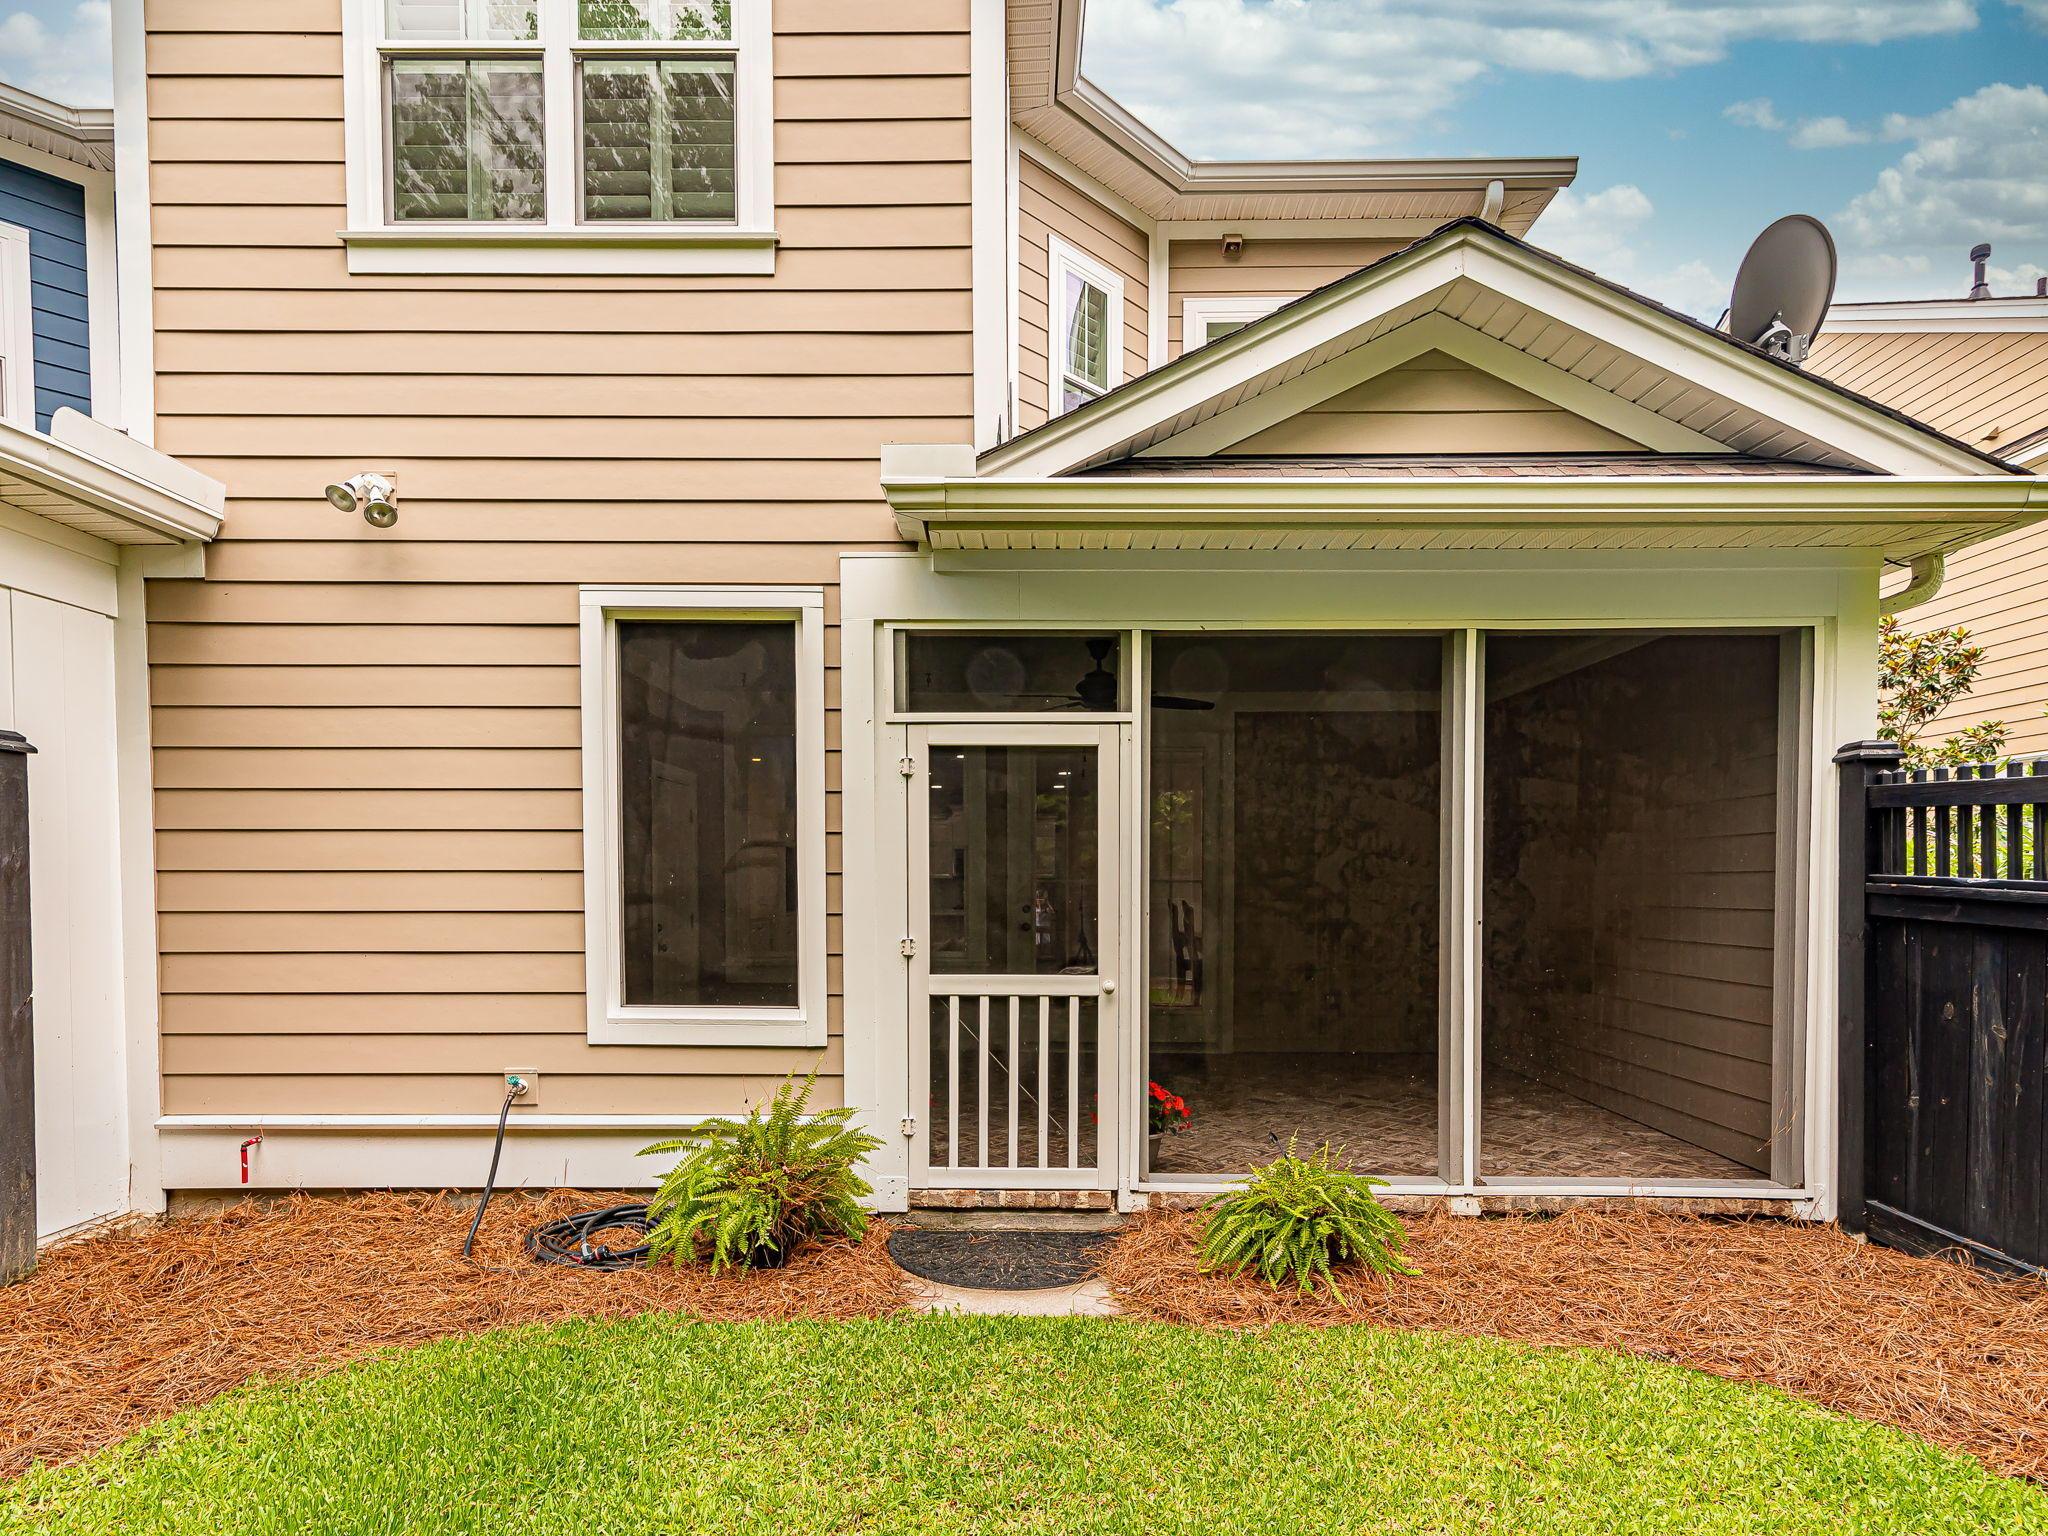 Dunes West Homes For Sale - 2476 Kings Gate, Mount Pleasant, SC - 28